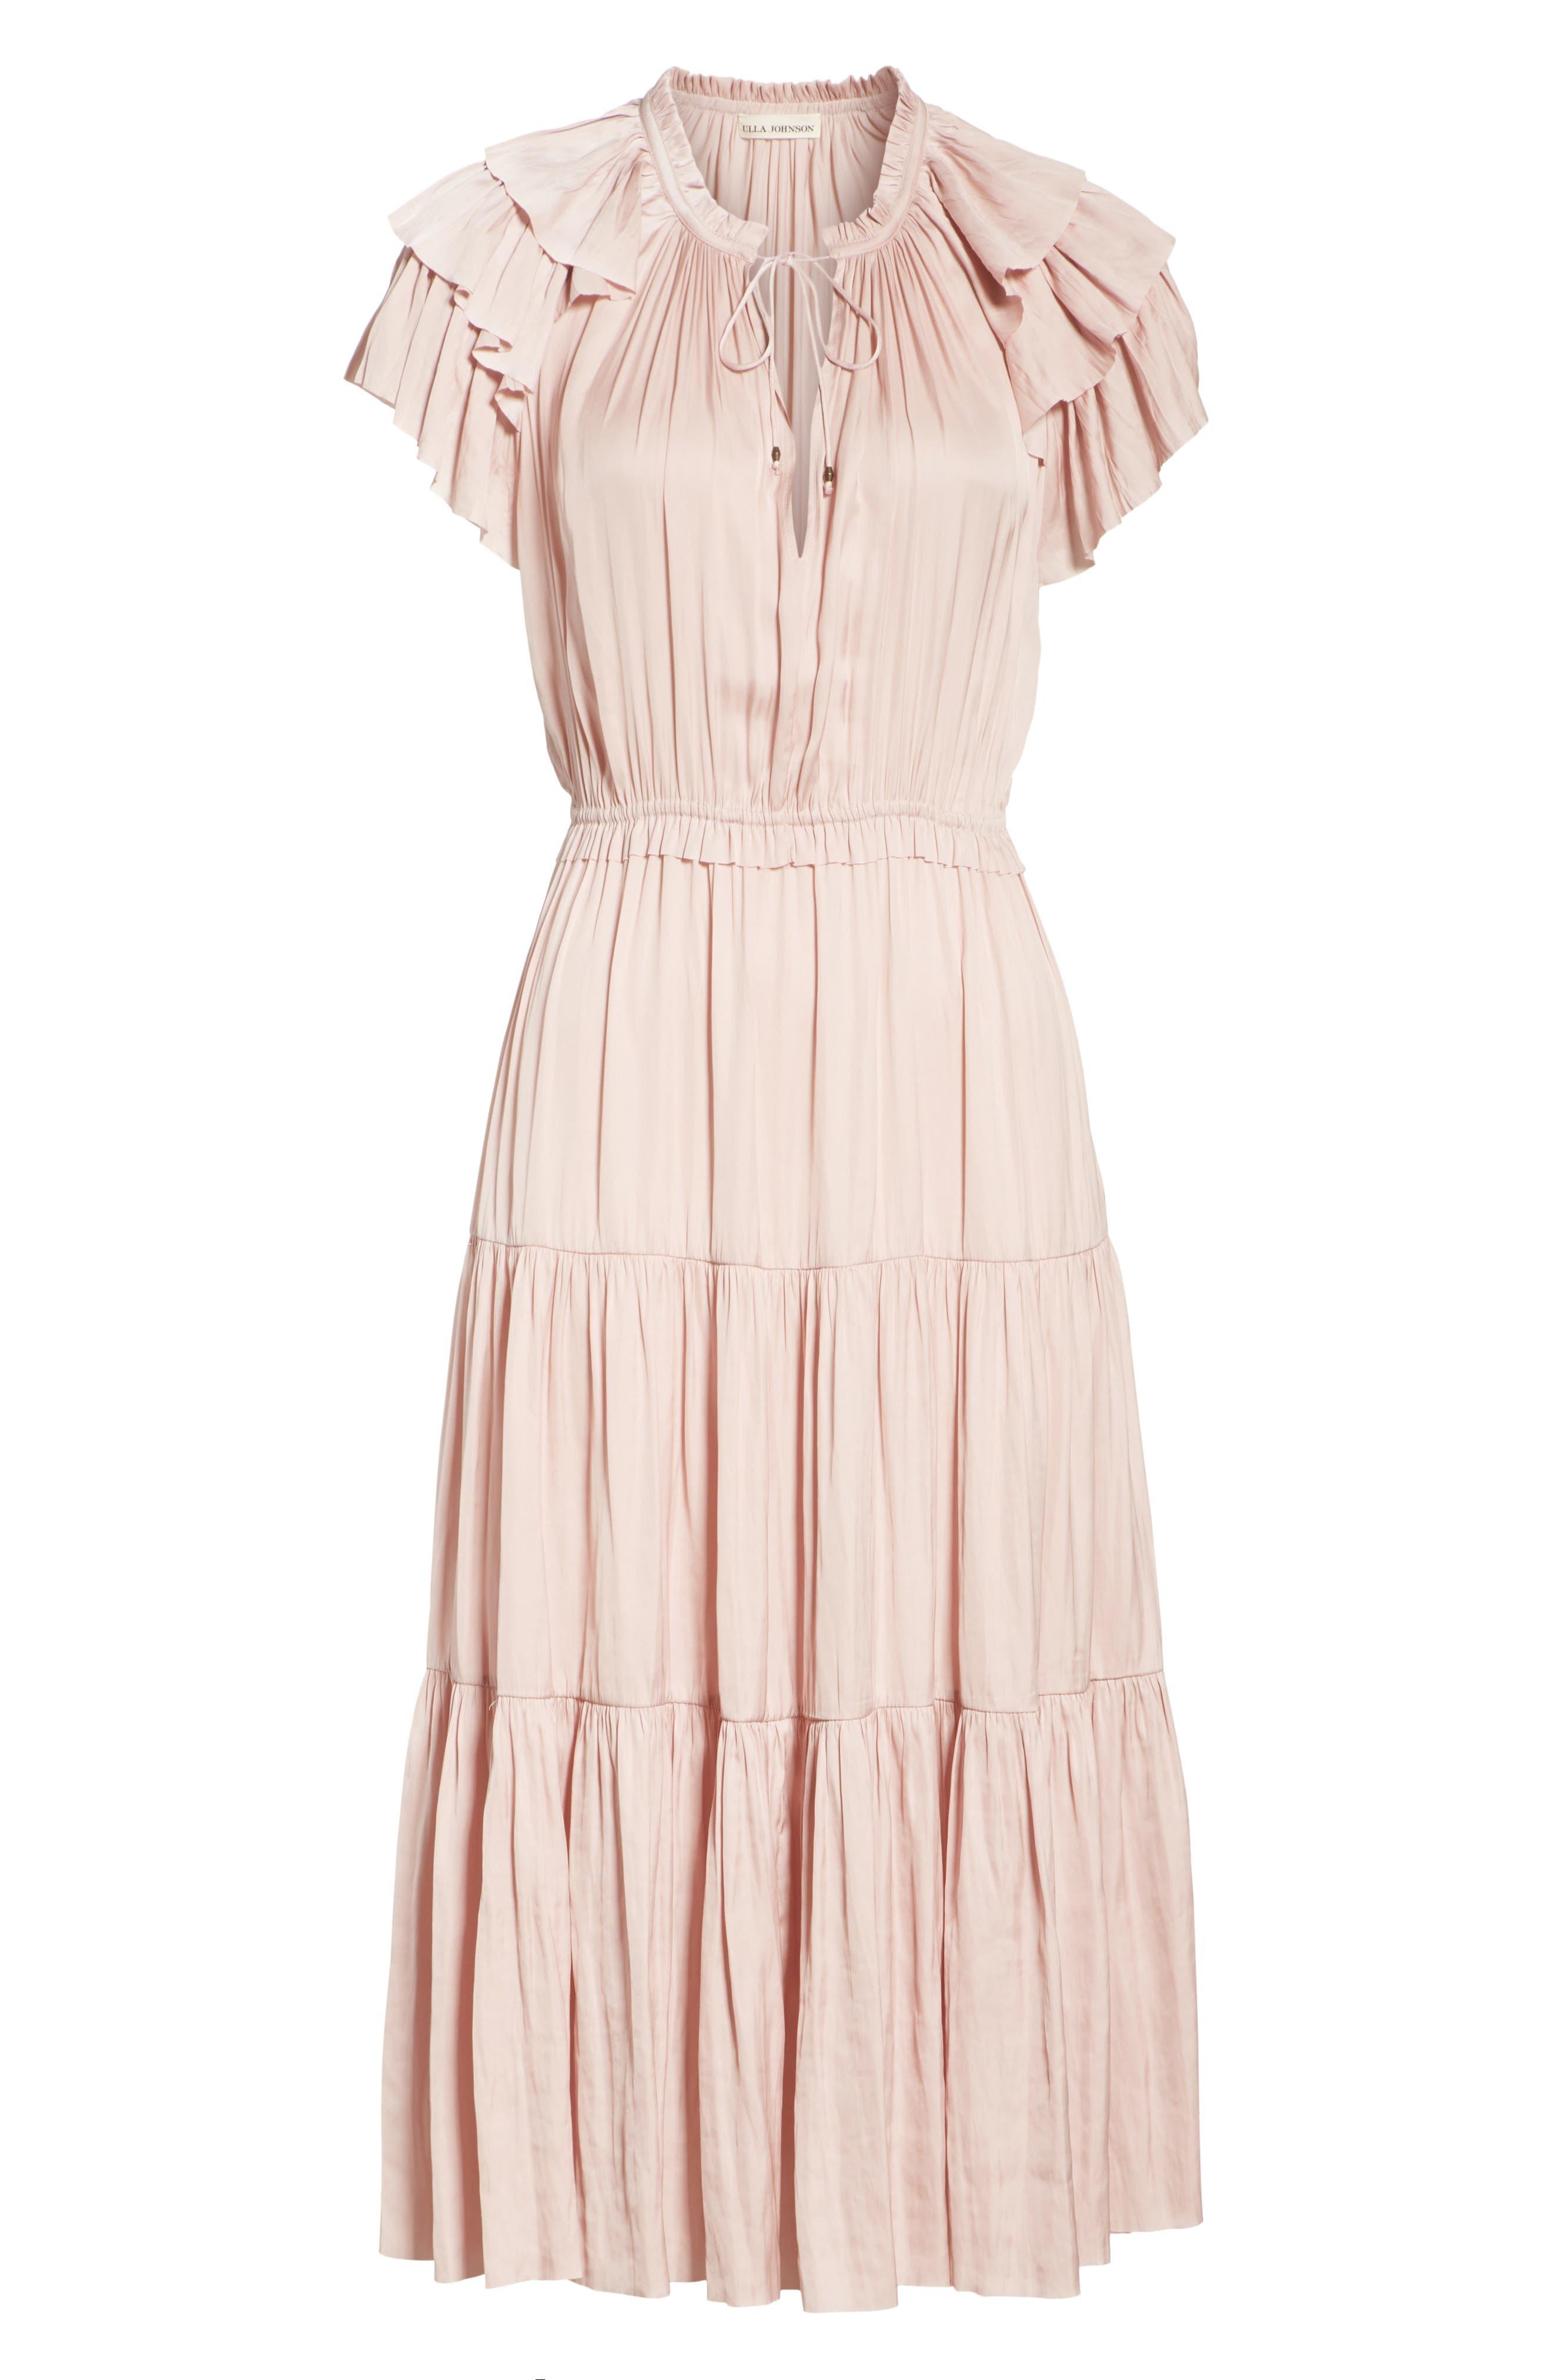 ULLA JOHNSON,                             Blaire Satin Dress,                             Alternate thumbnail 6, color,                             600